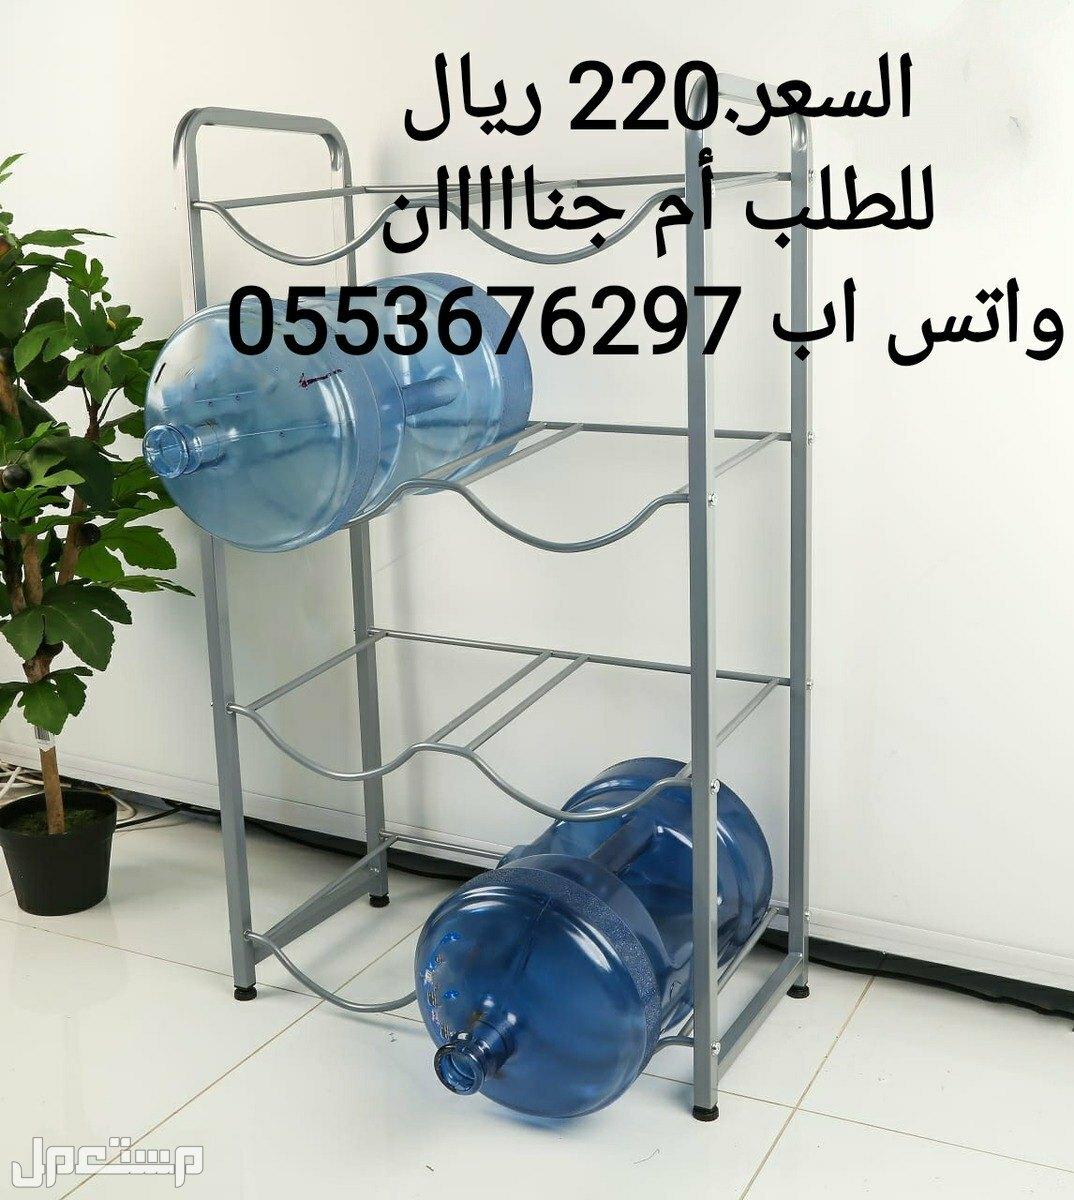 حامل و منظم قوارير مياه معدن فولاز فضي